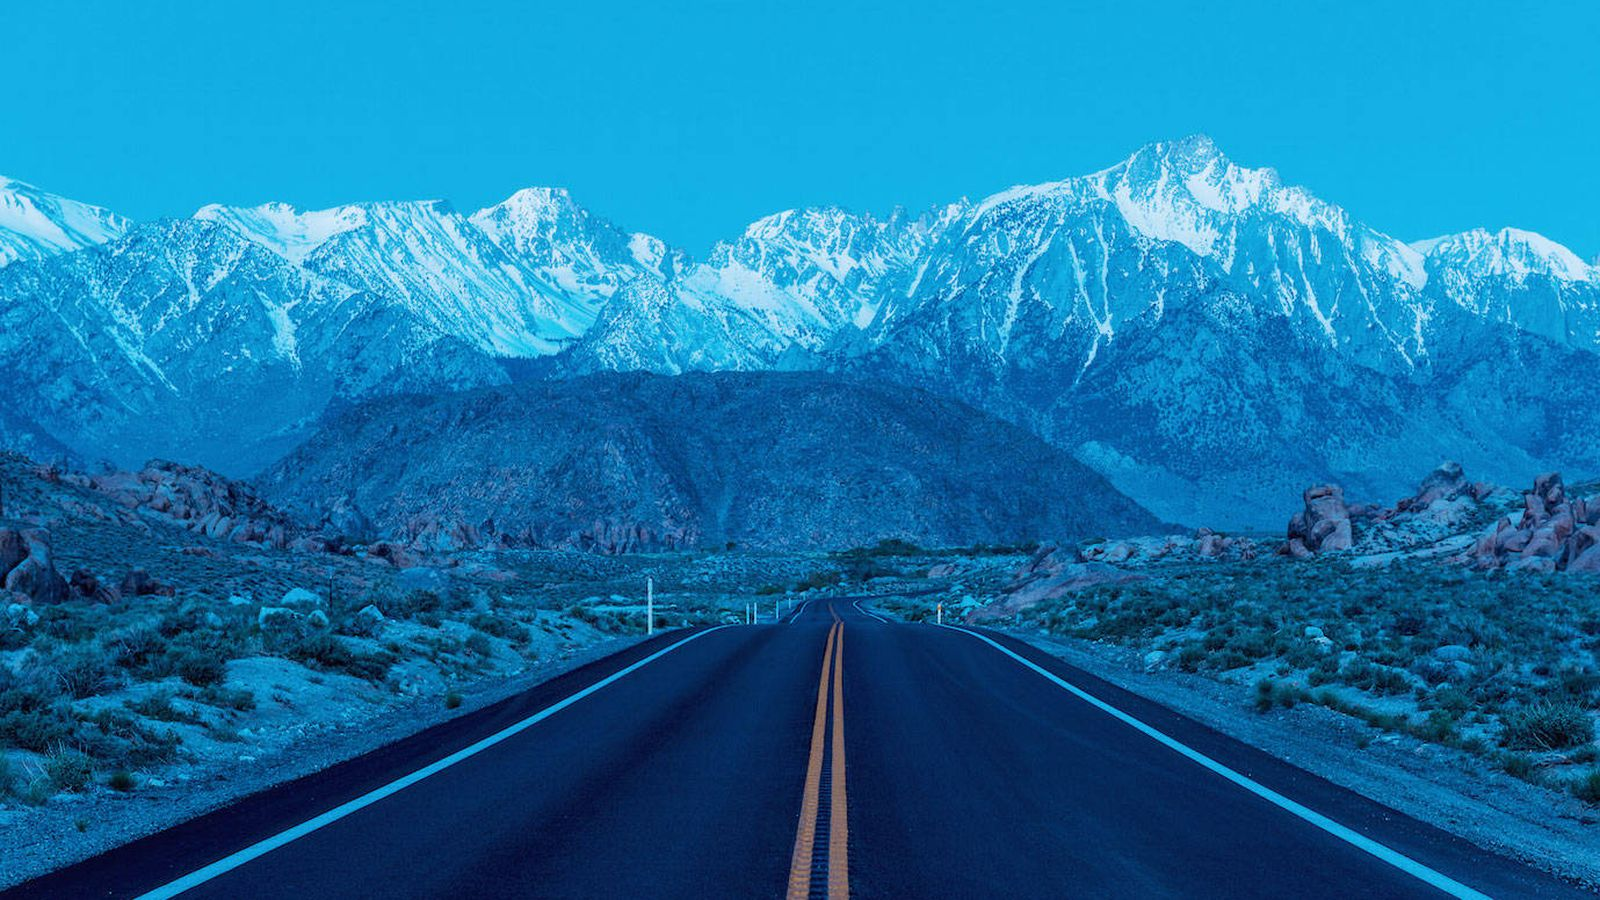 Foto: Alabama Hills, en el desierto de California. (Foto: Simon Davidson para Parfums CHRISTIAN Dior)